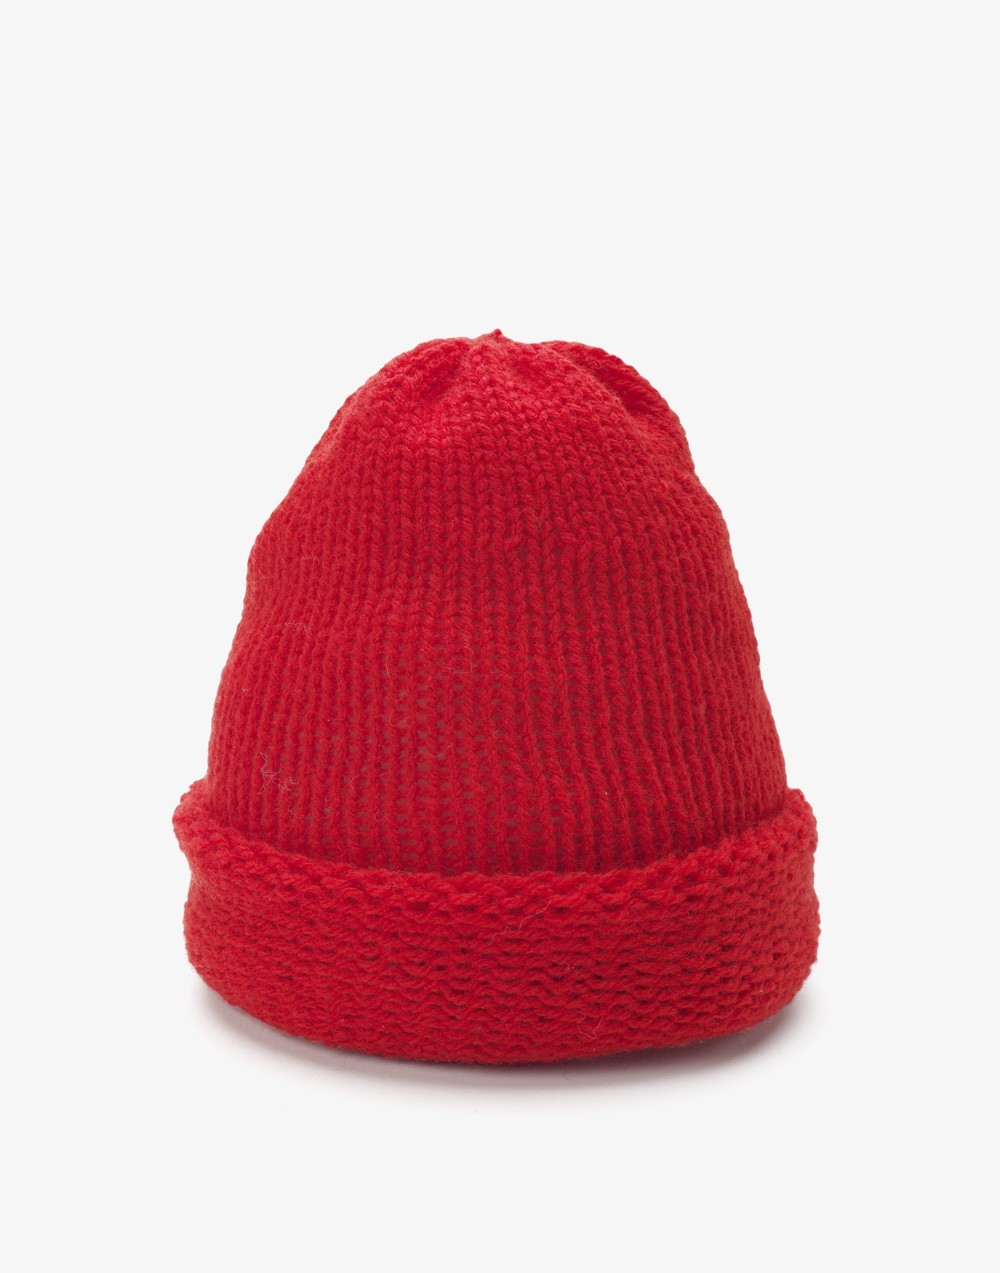 the-rocking-knit-low-tech-factory-ecal-3